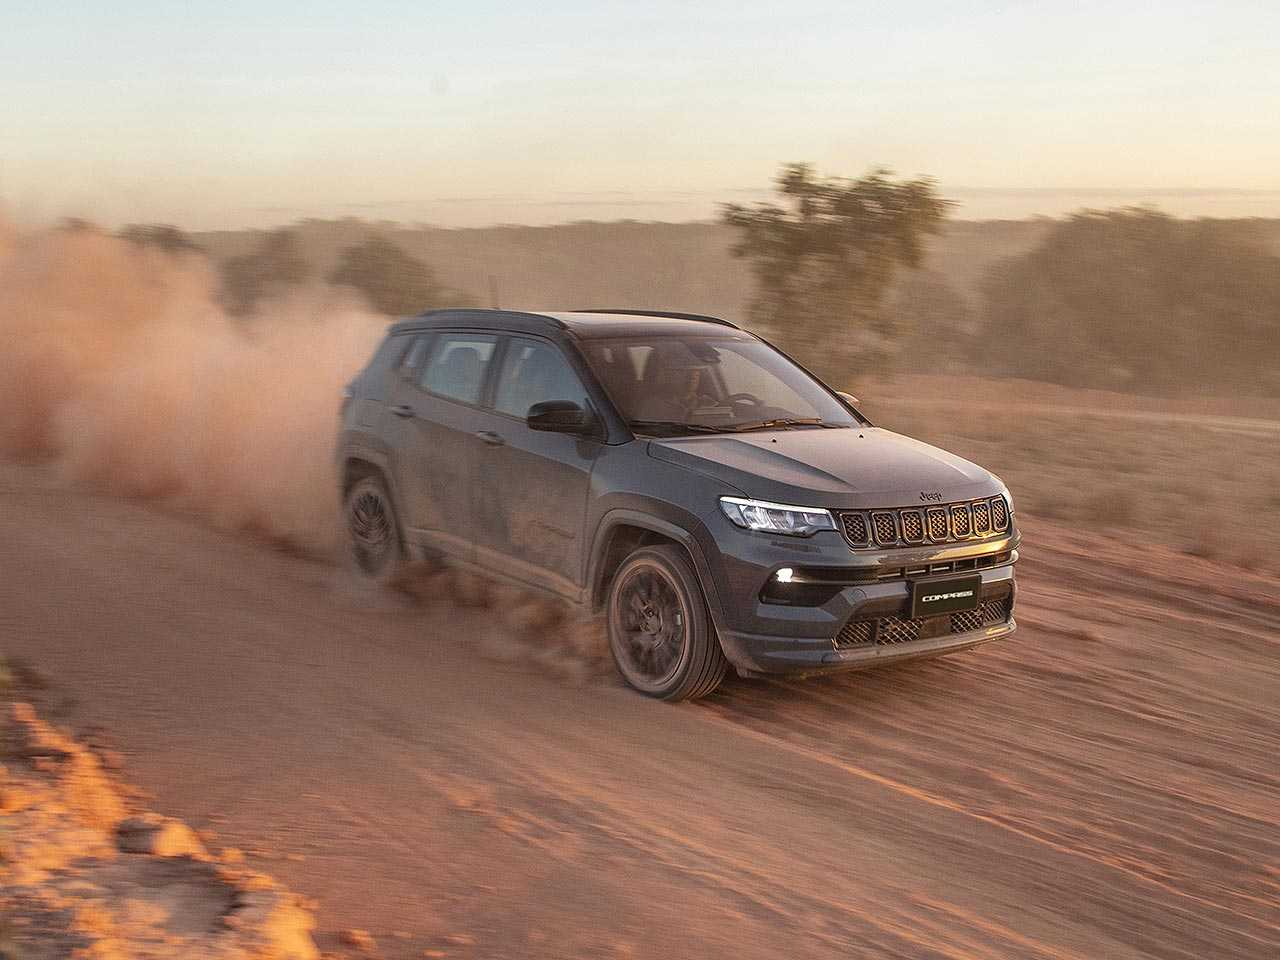 Jeep Compass segue deixando os concorrentes comendo poeira...